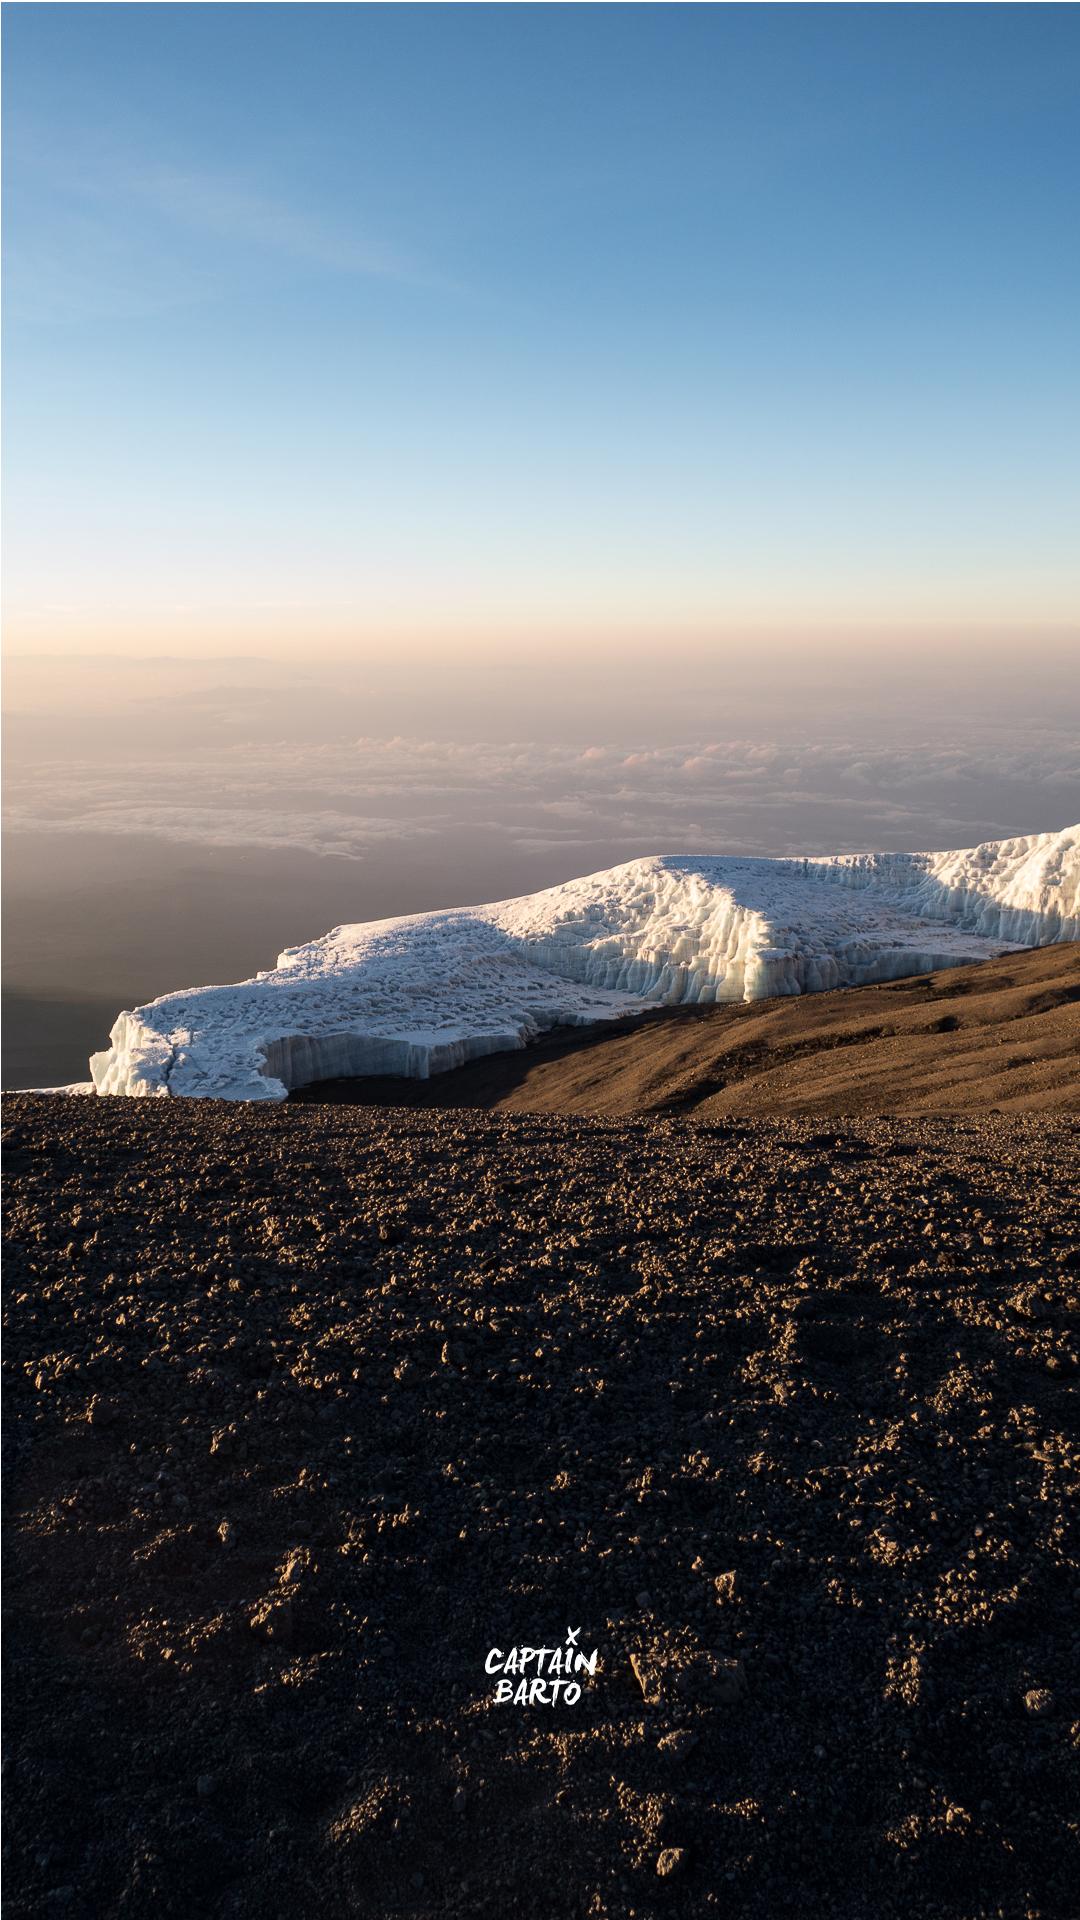 captainbarto-blog-wallpaper-climbing-mtkilimanjaro-110817-12.jpg